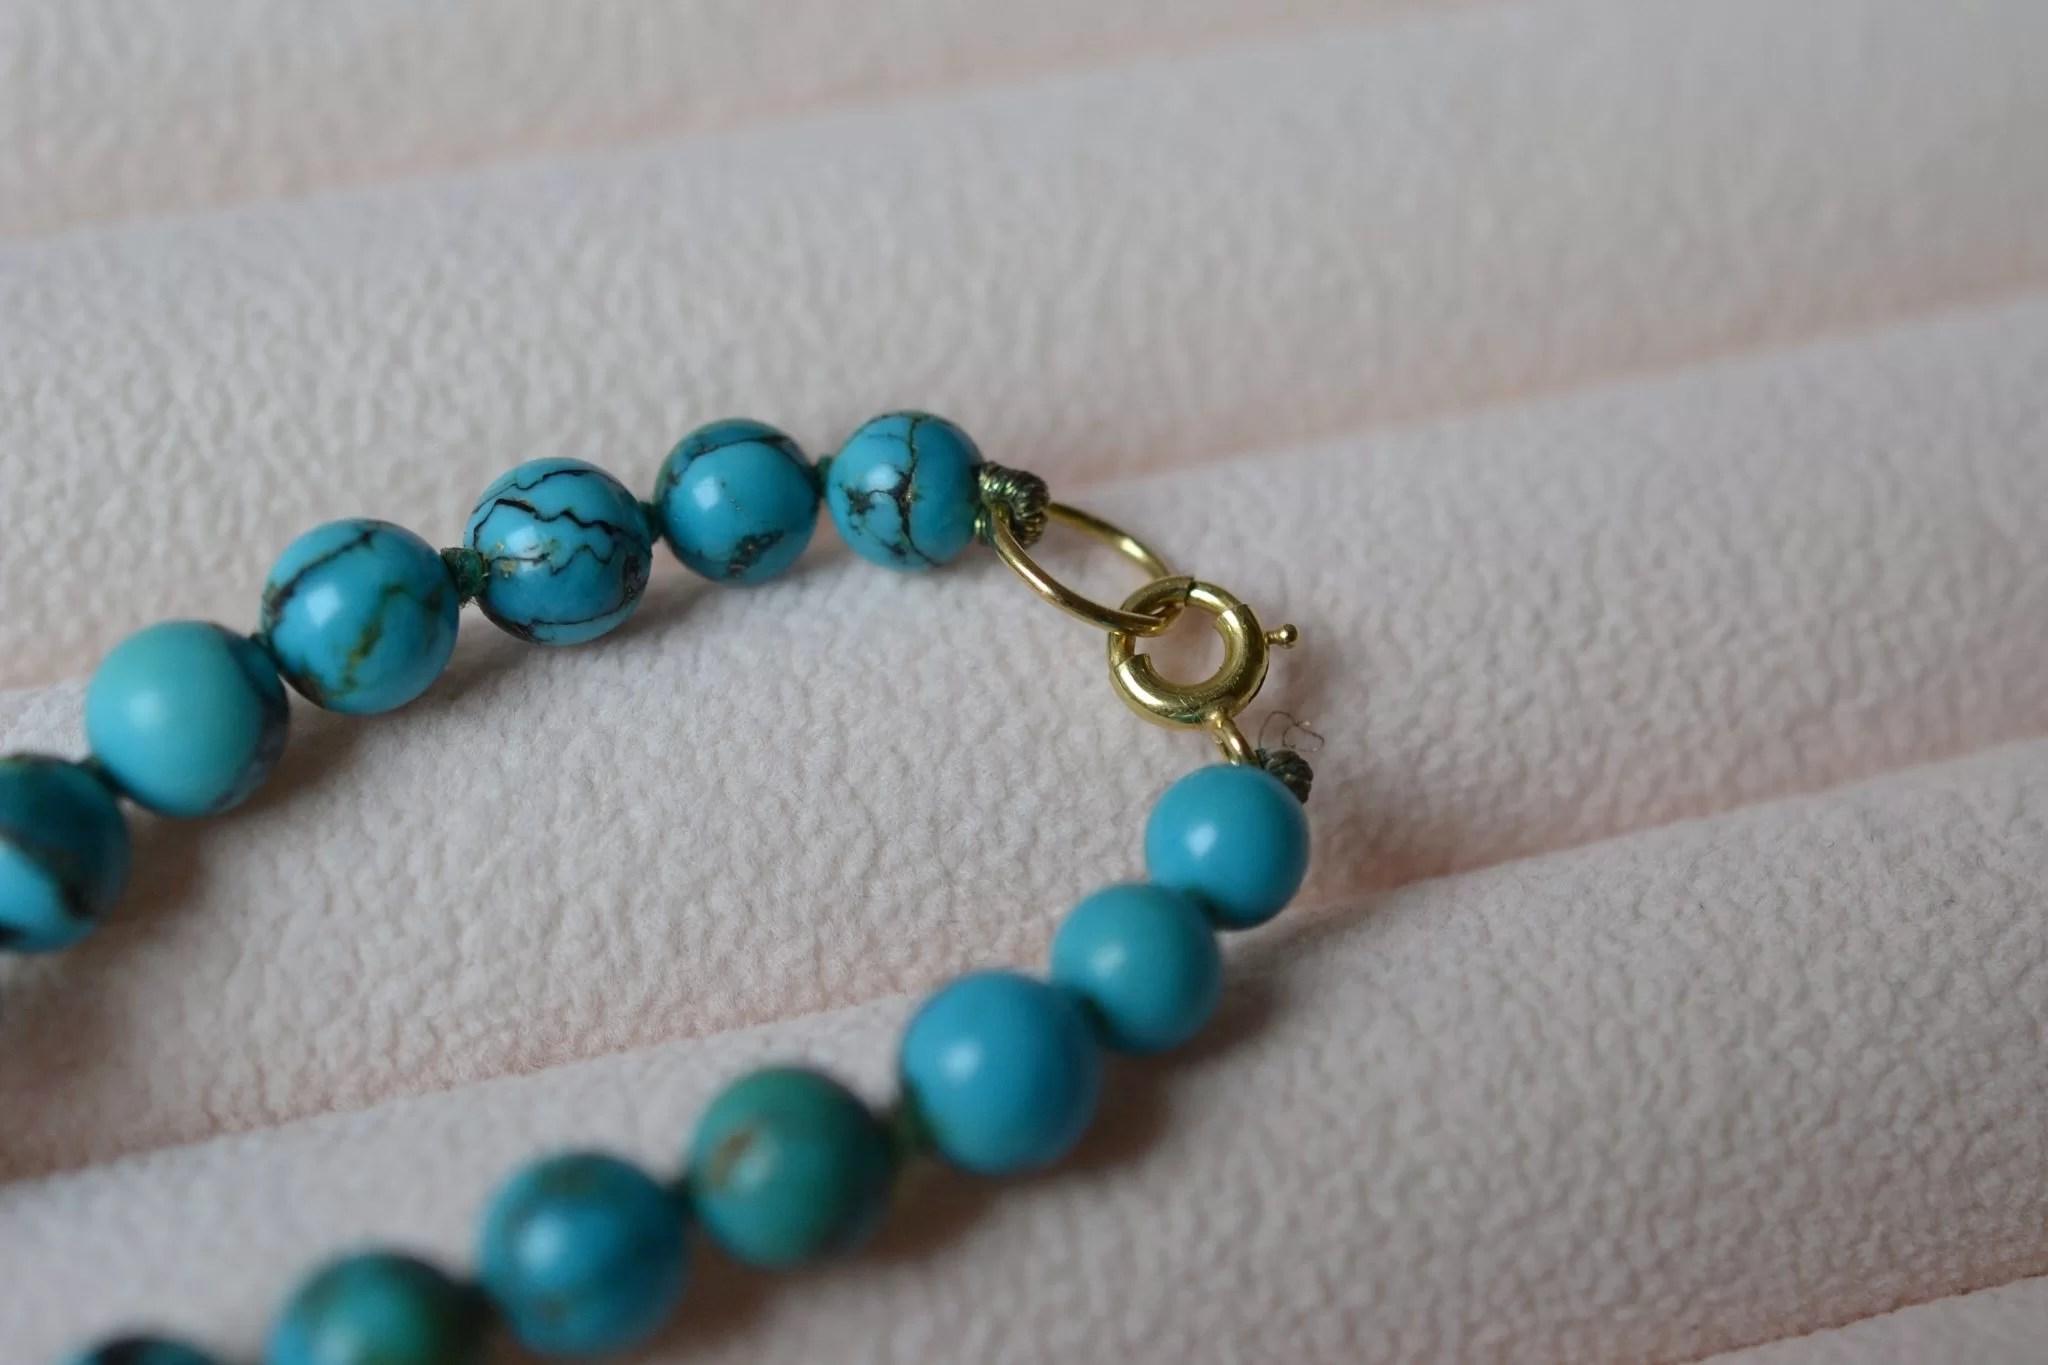 collier-perles-de-turquoise-bijou-retro